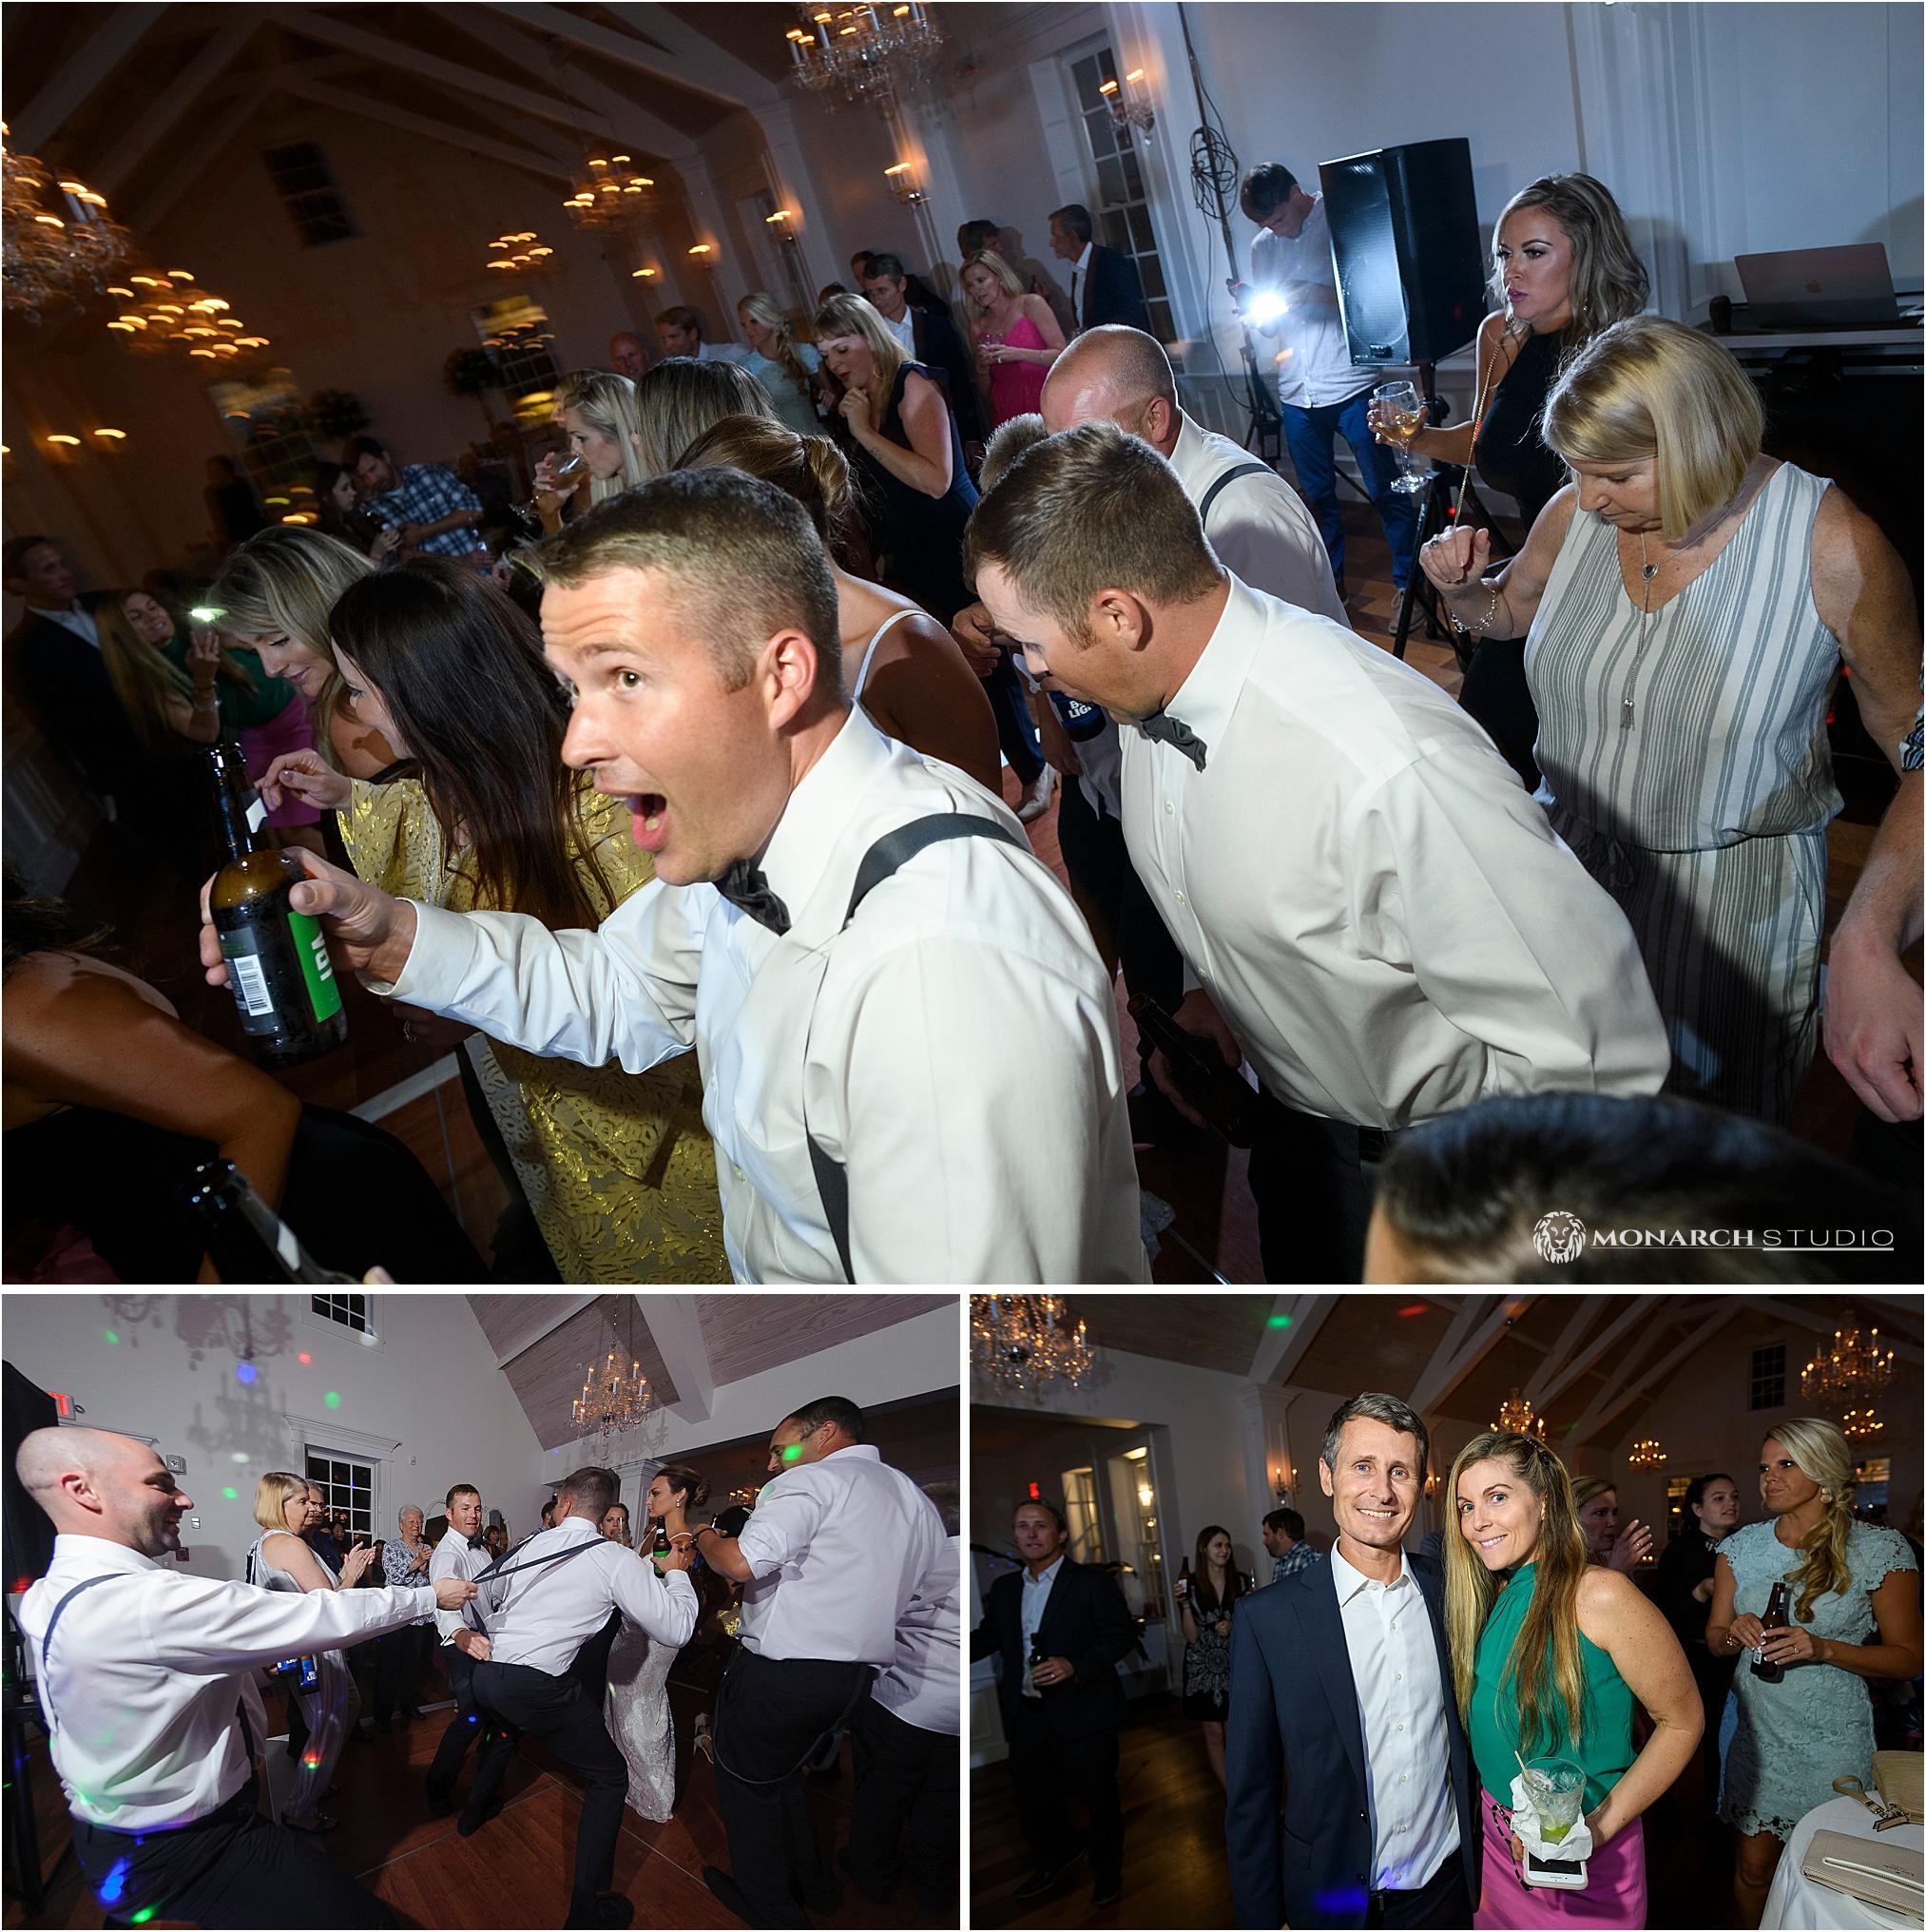 108-whiteroom-wedding-photographer-2019-05-22_0090.jpg